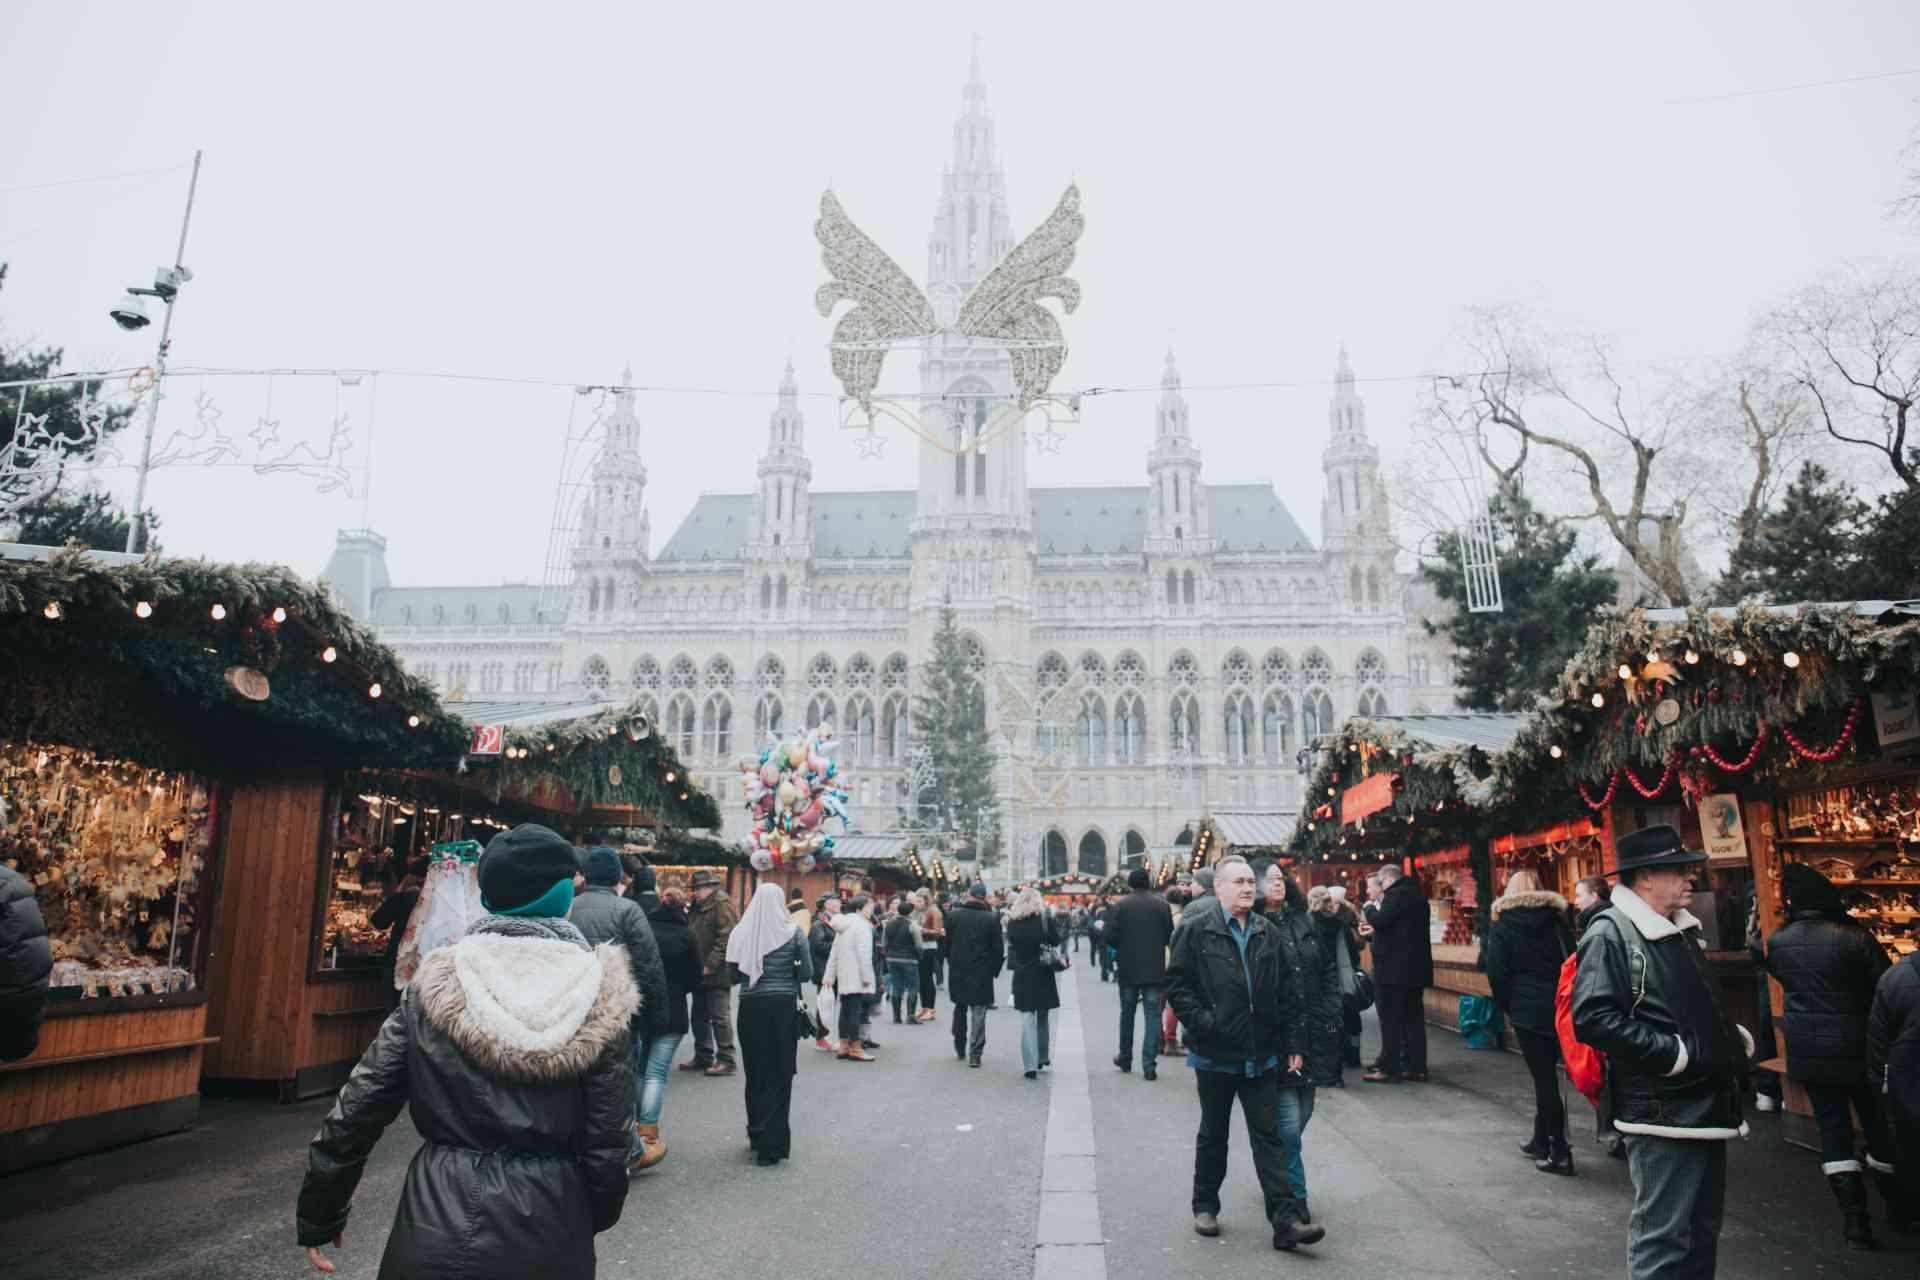 Vienna Christmas Markets, Austria by Alisa Anton/Unsplash